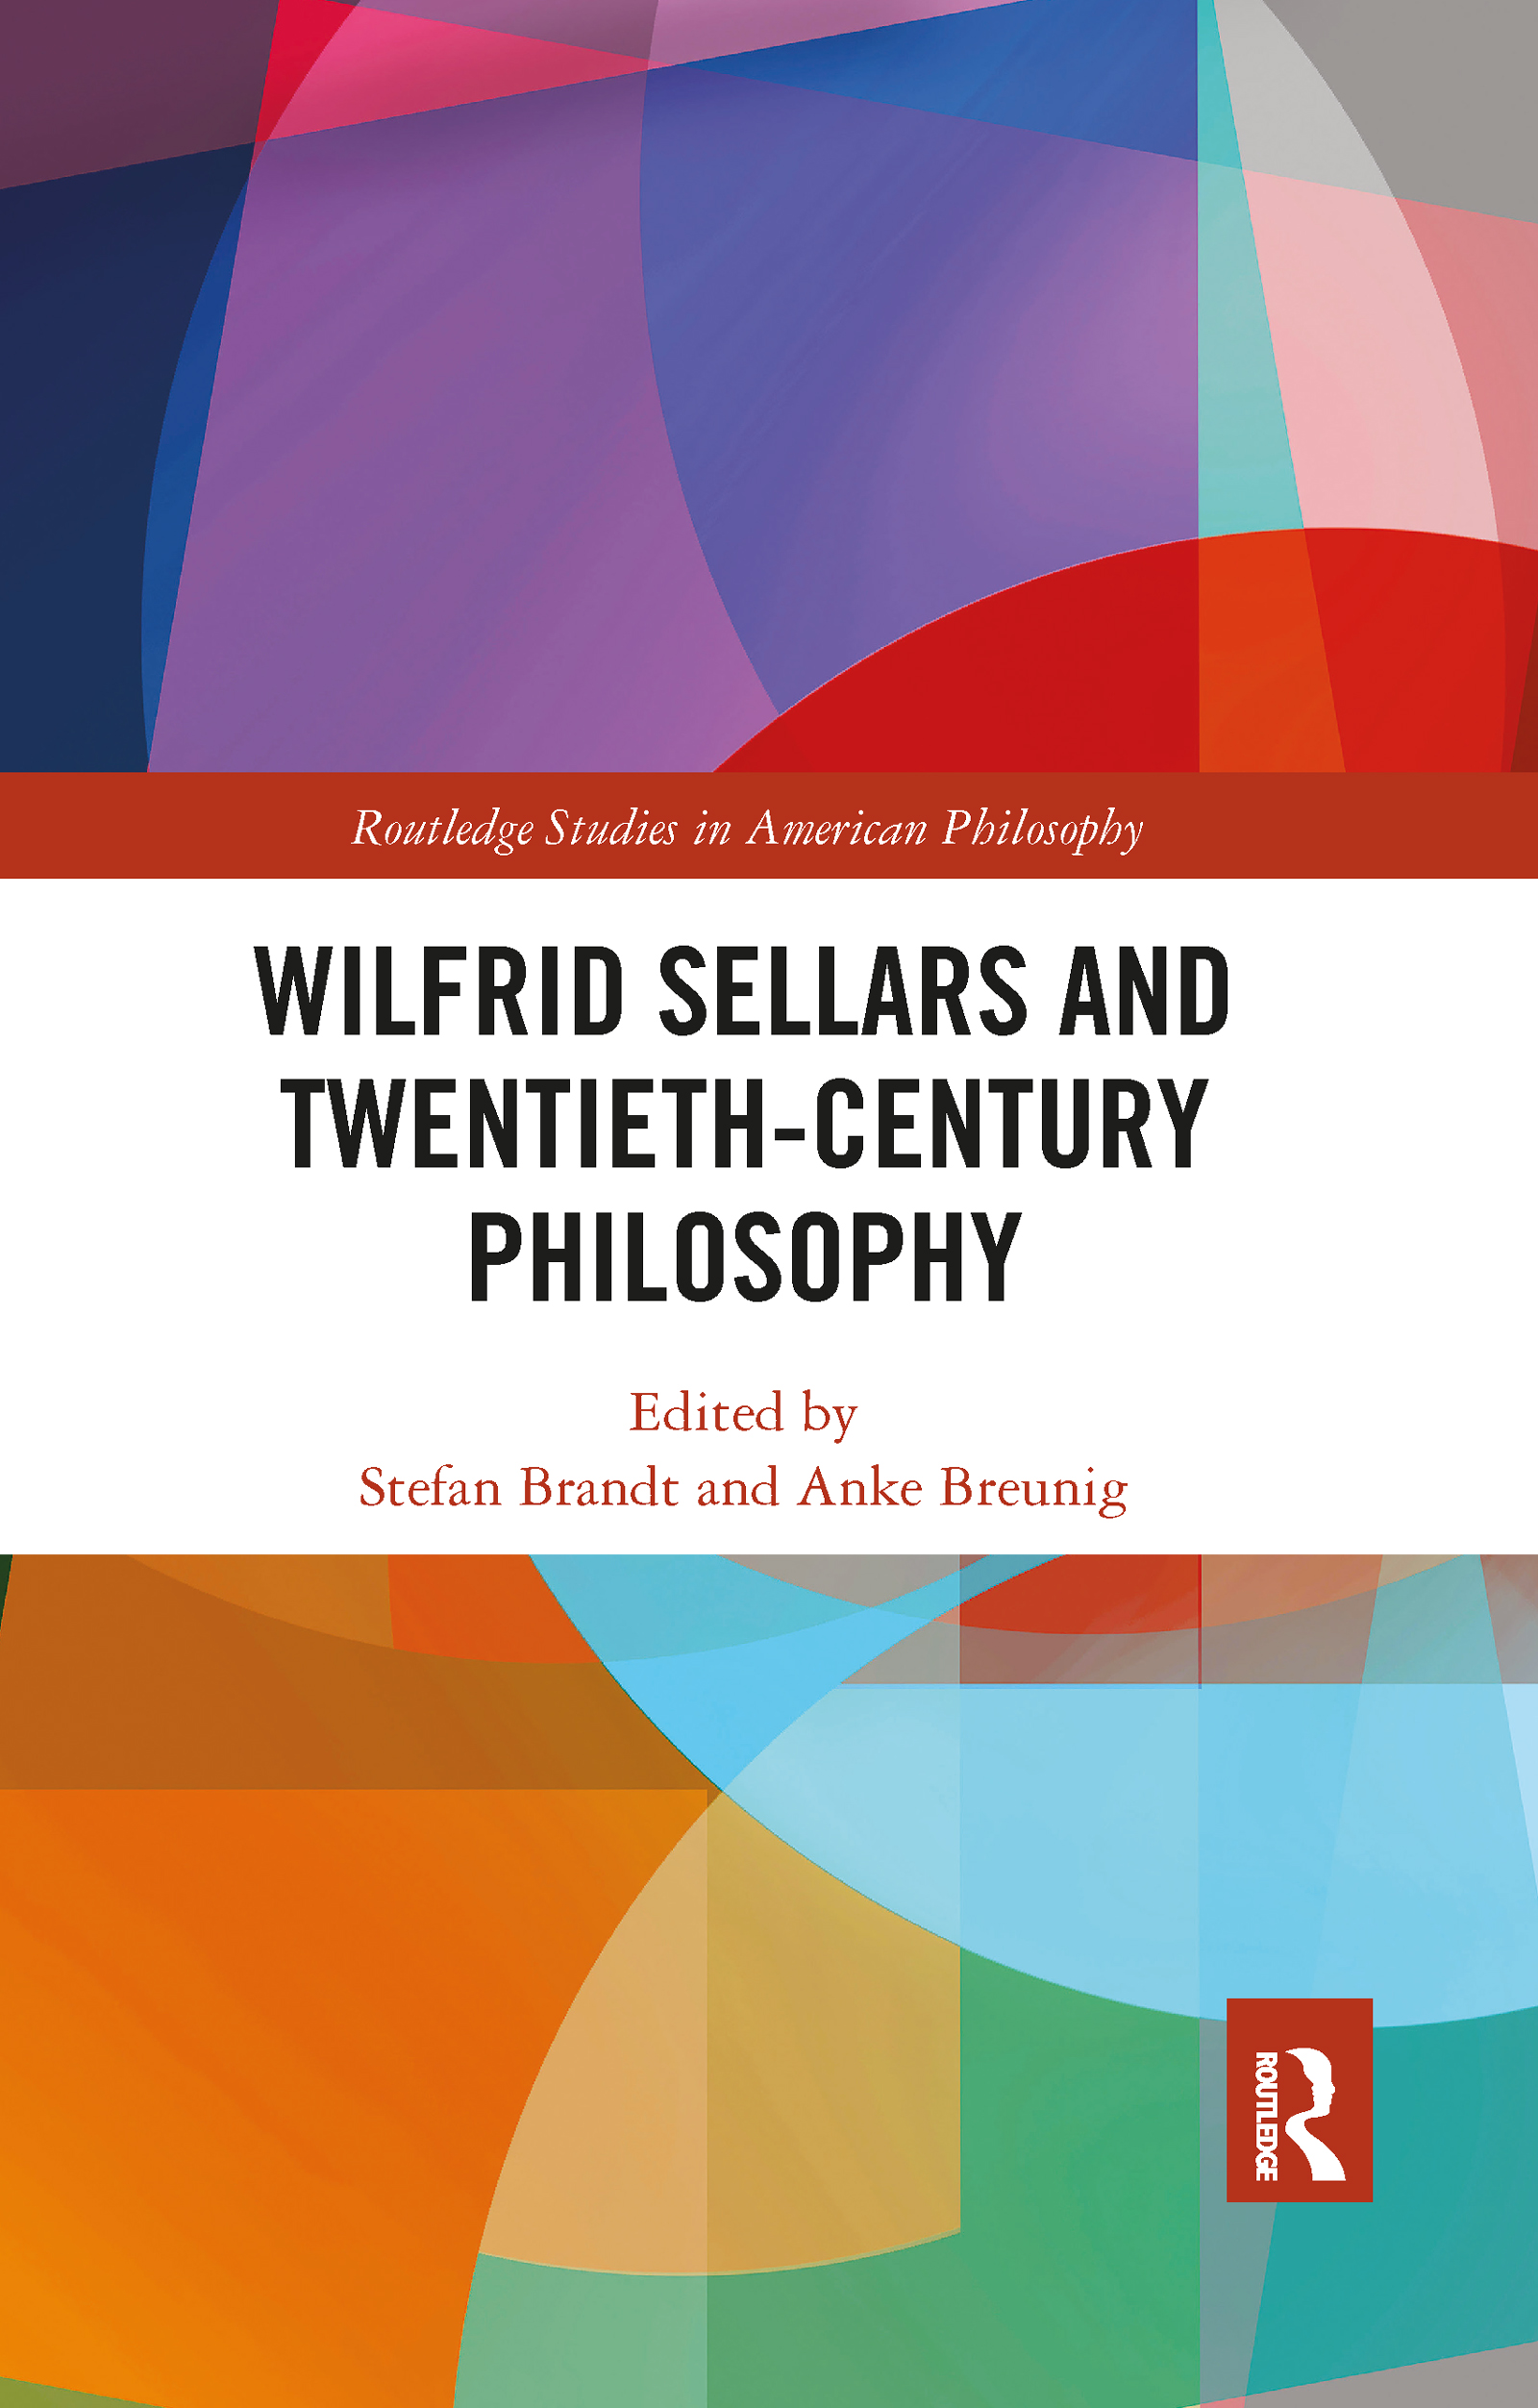 Wilfrid Sellars and Twentieth-Century Philosophy